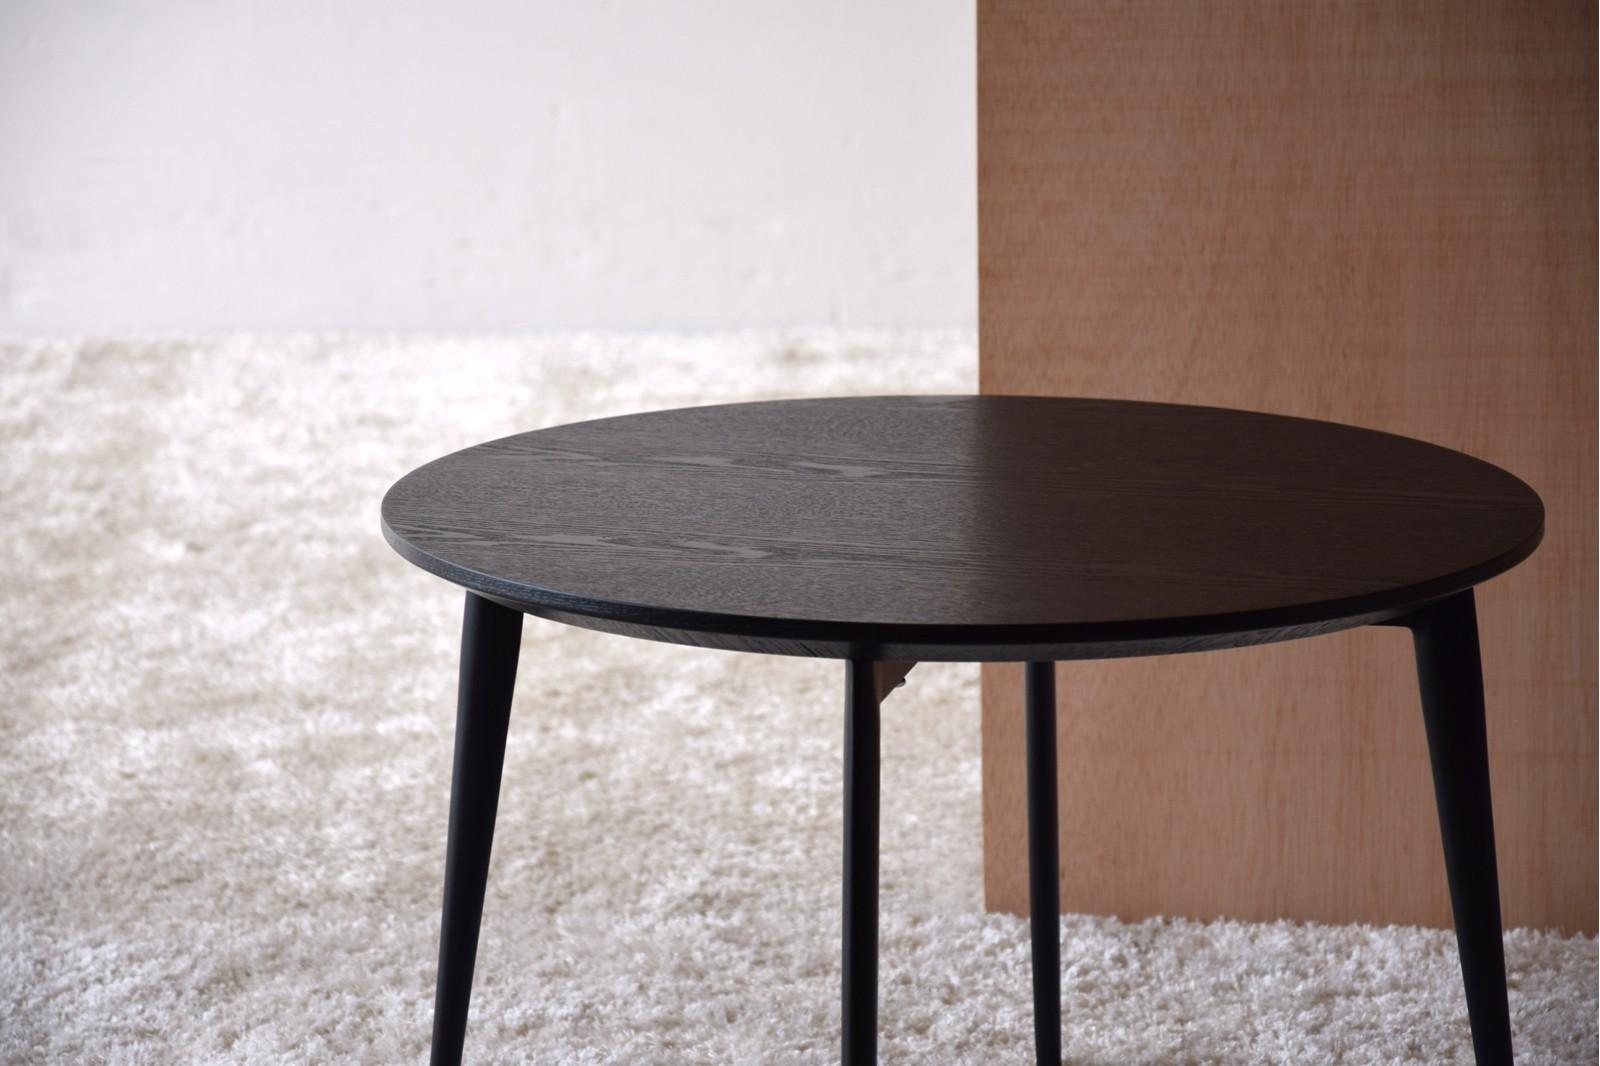 ROUND SIDE TABLE. MATT BLACK ASH VENEER.METAL. L